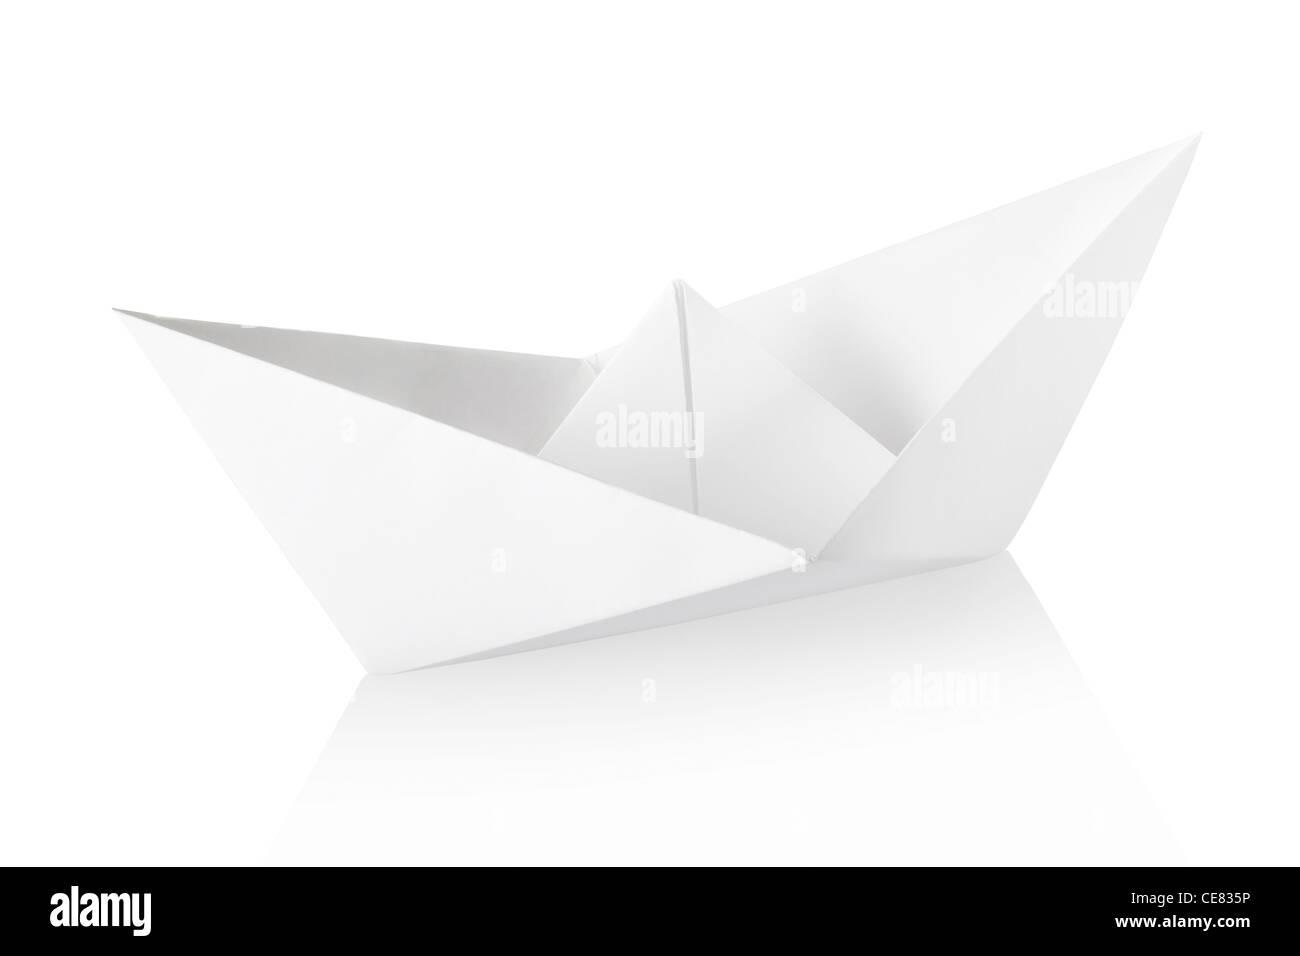 Barco de papel Imagen De Stock